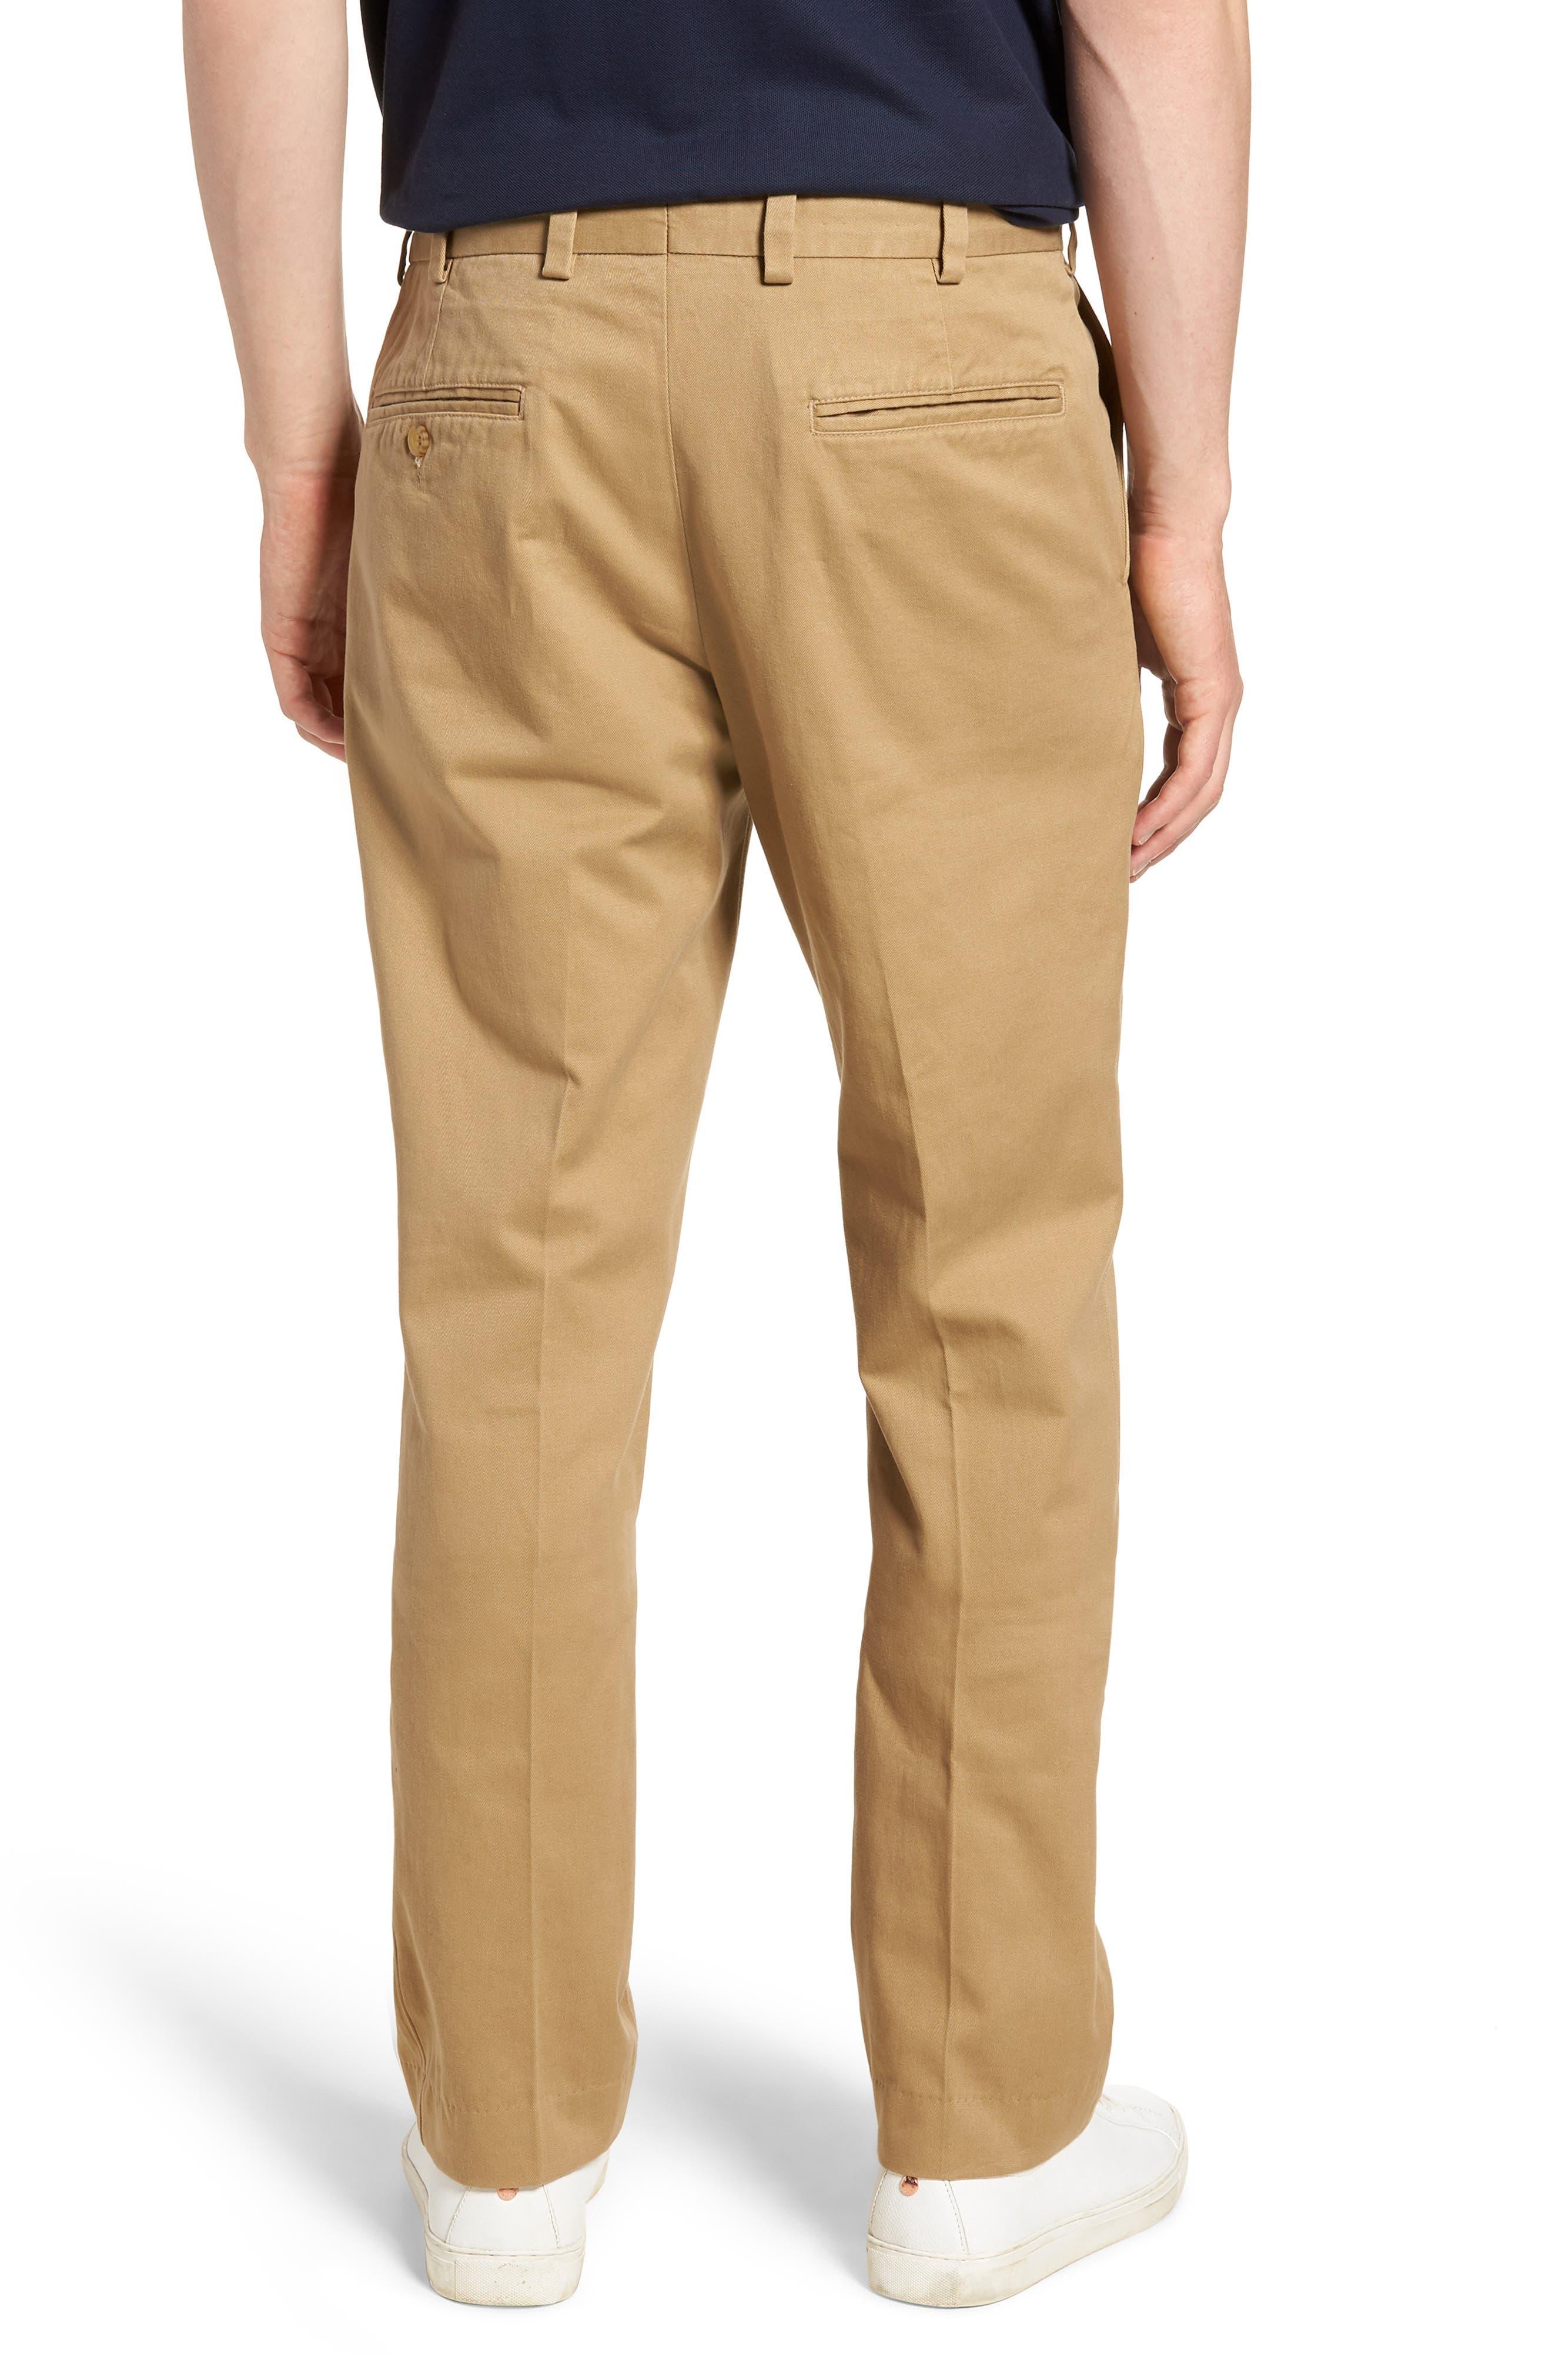 M3 Straight Fit Vintage Twill Flat Front Pants,                             Alternate thumbnail 2, color,                             British Khaki